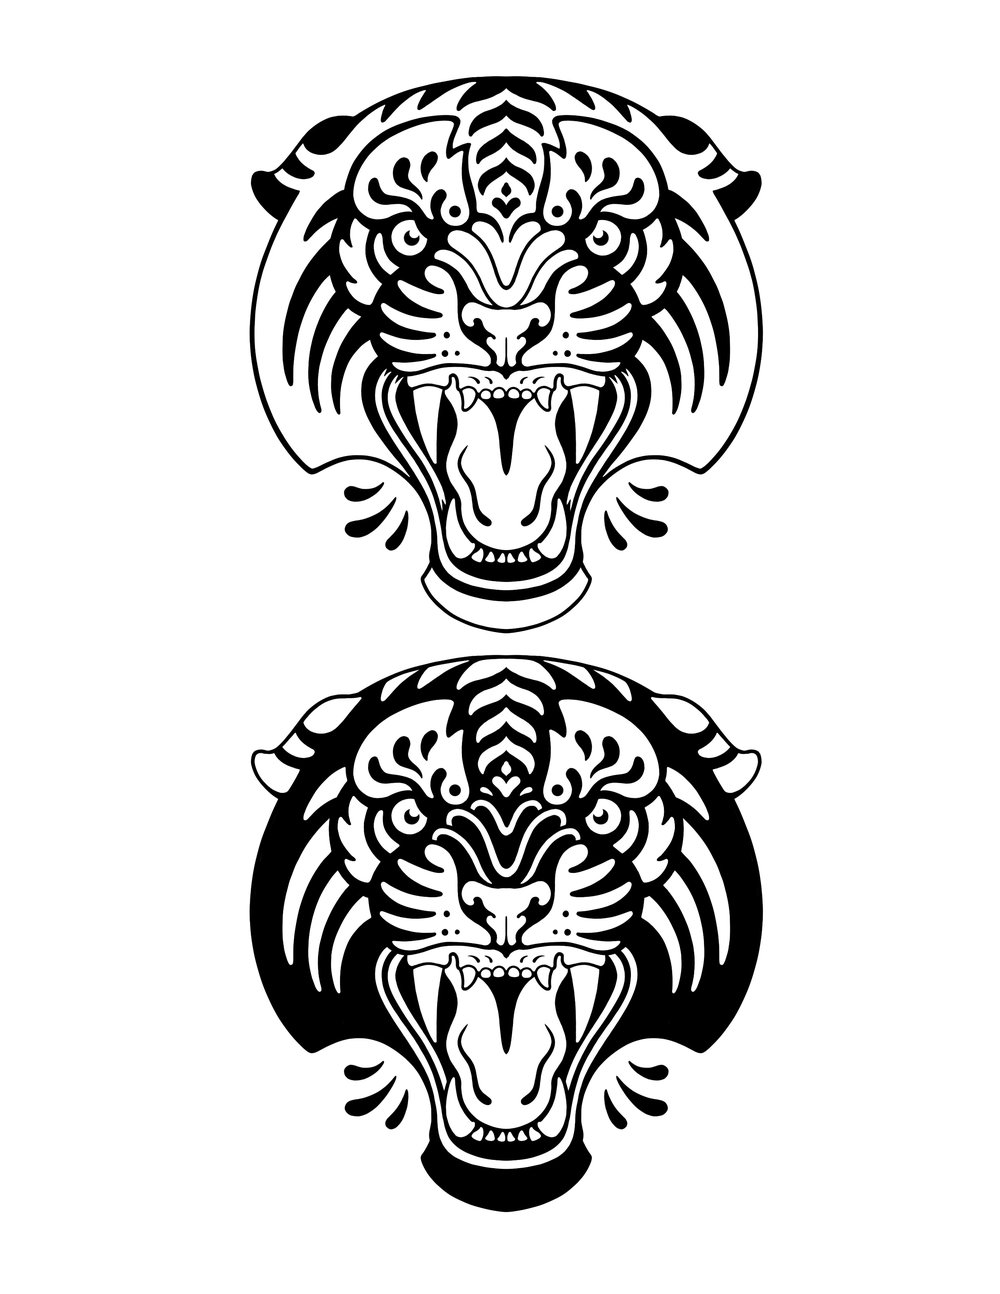 tiger-rfnd copy.jpg